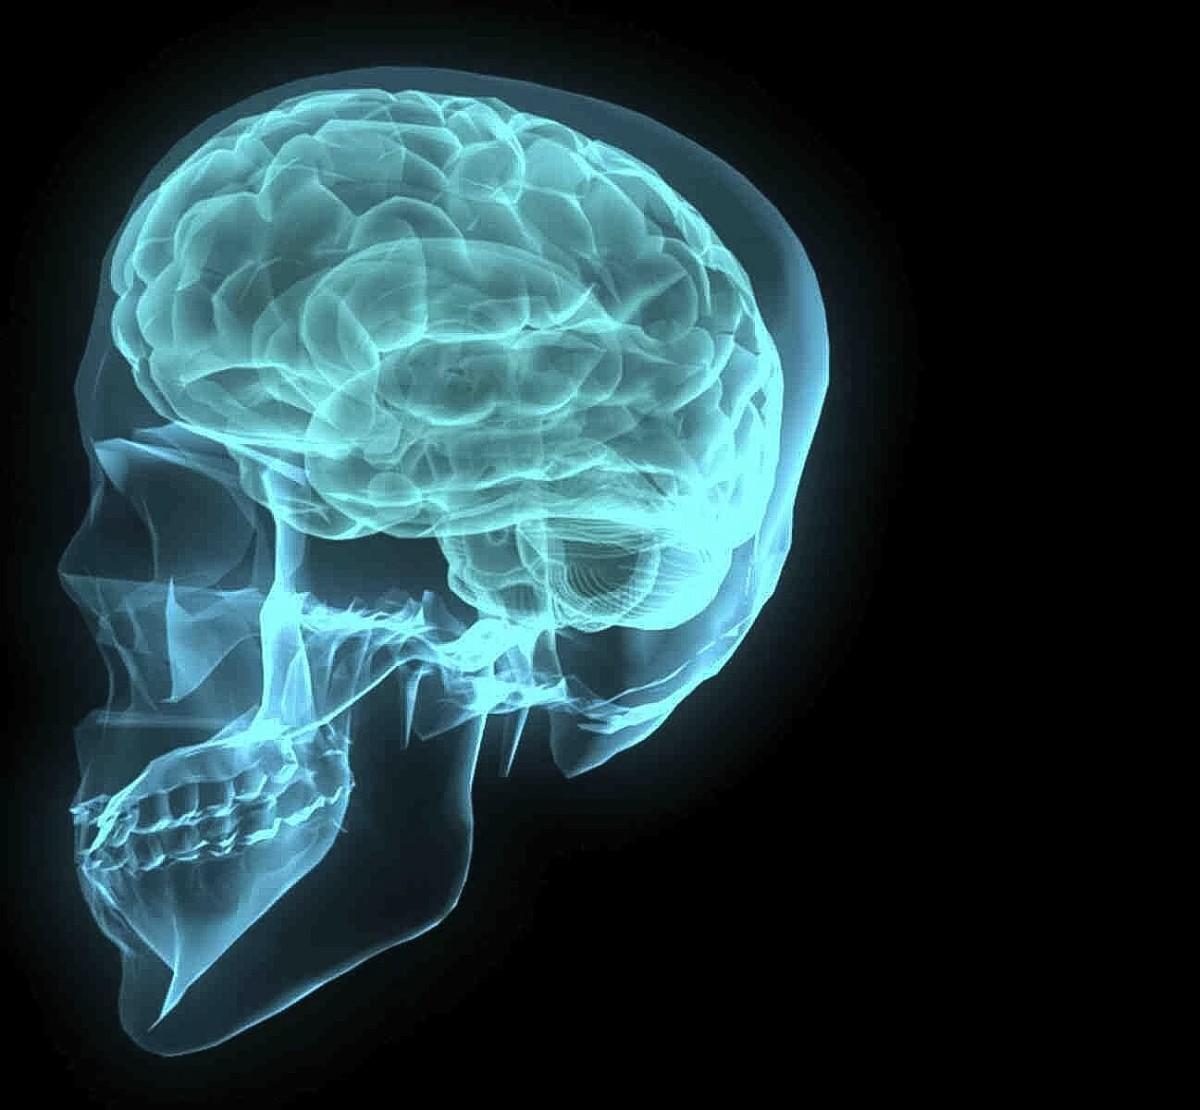 An artistic representation of the human brain